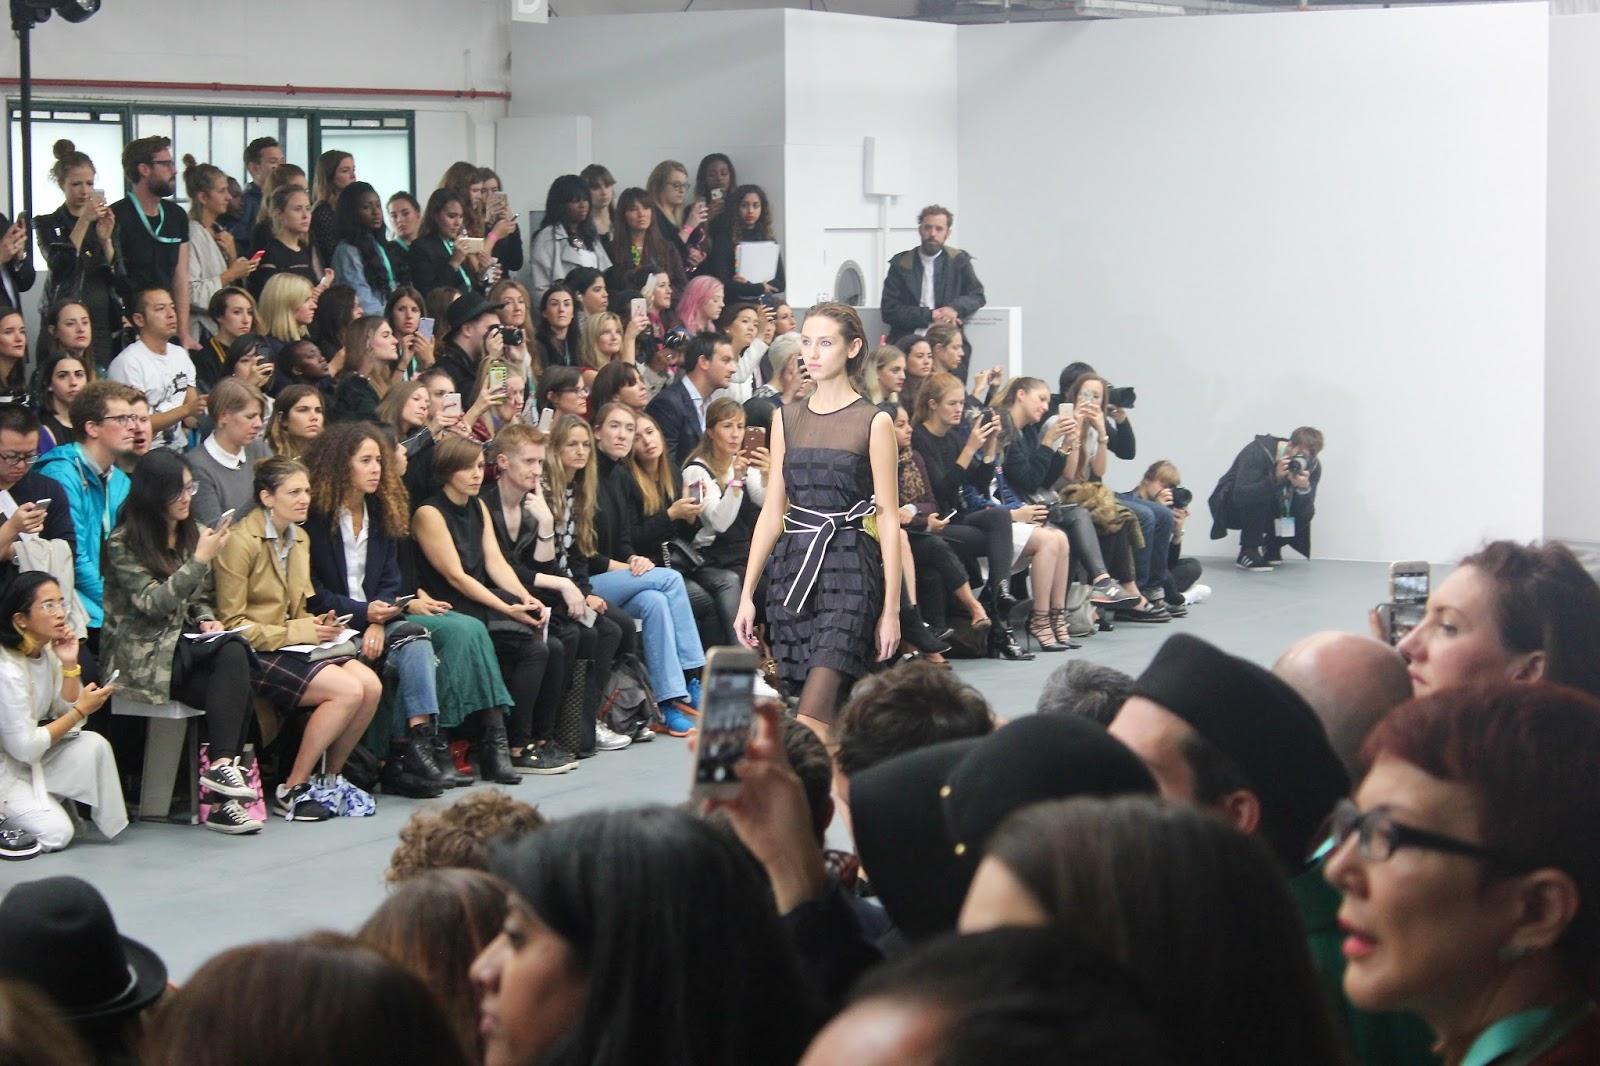 Georgie Minter-Brown, actress, blogger, london fashion week, SS16, designer, catwalk, christopher raeburn, BFC, clothes